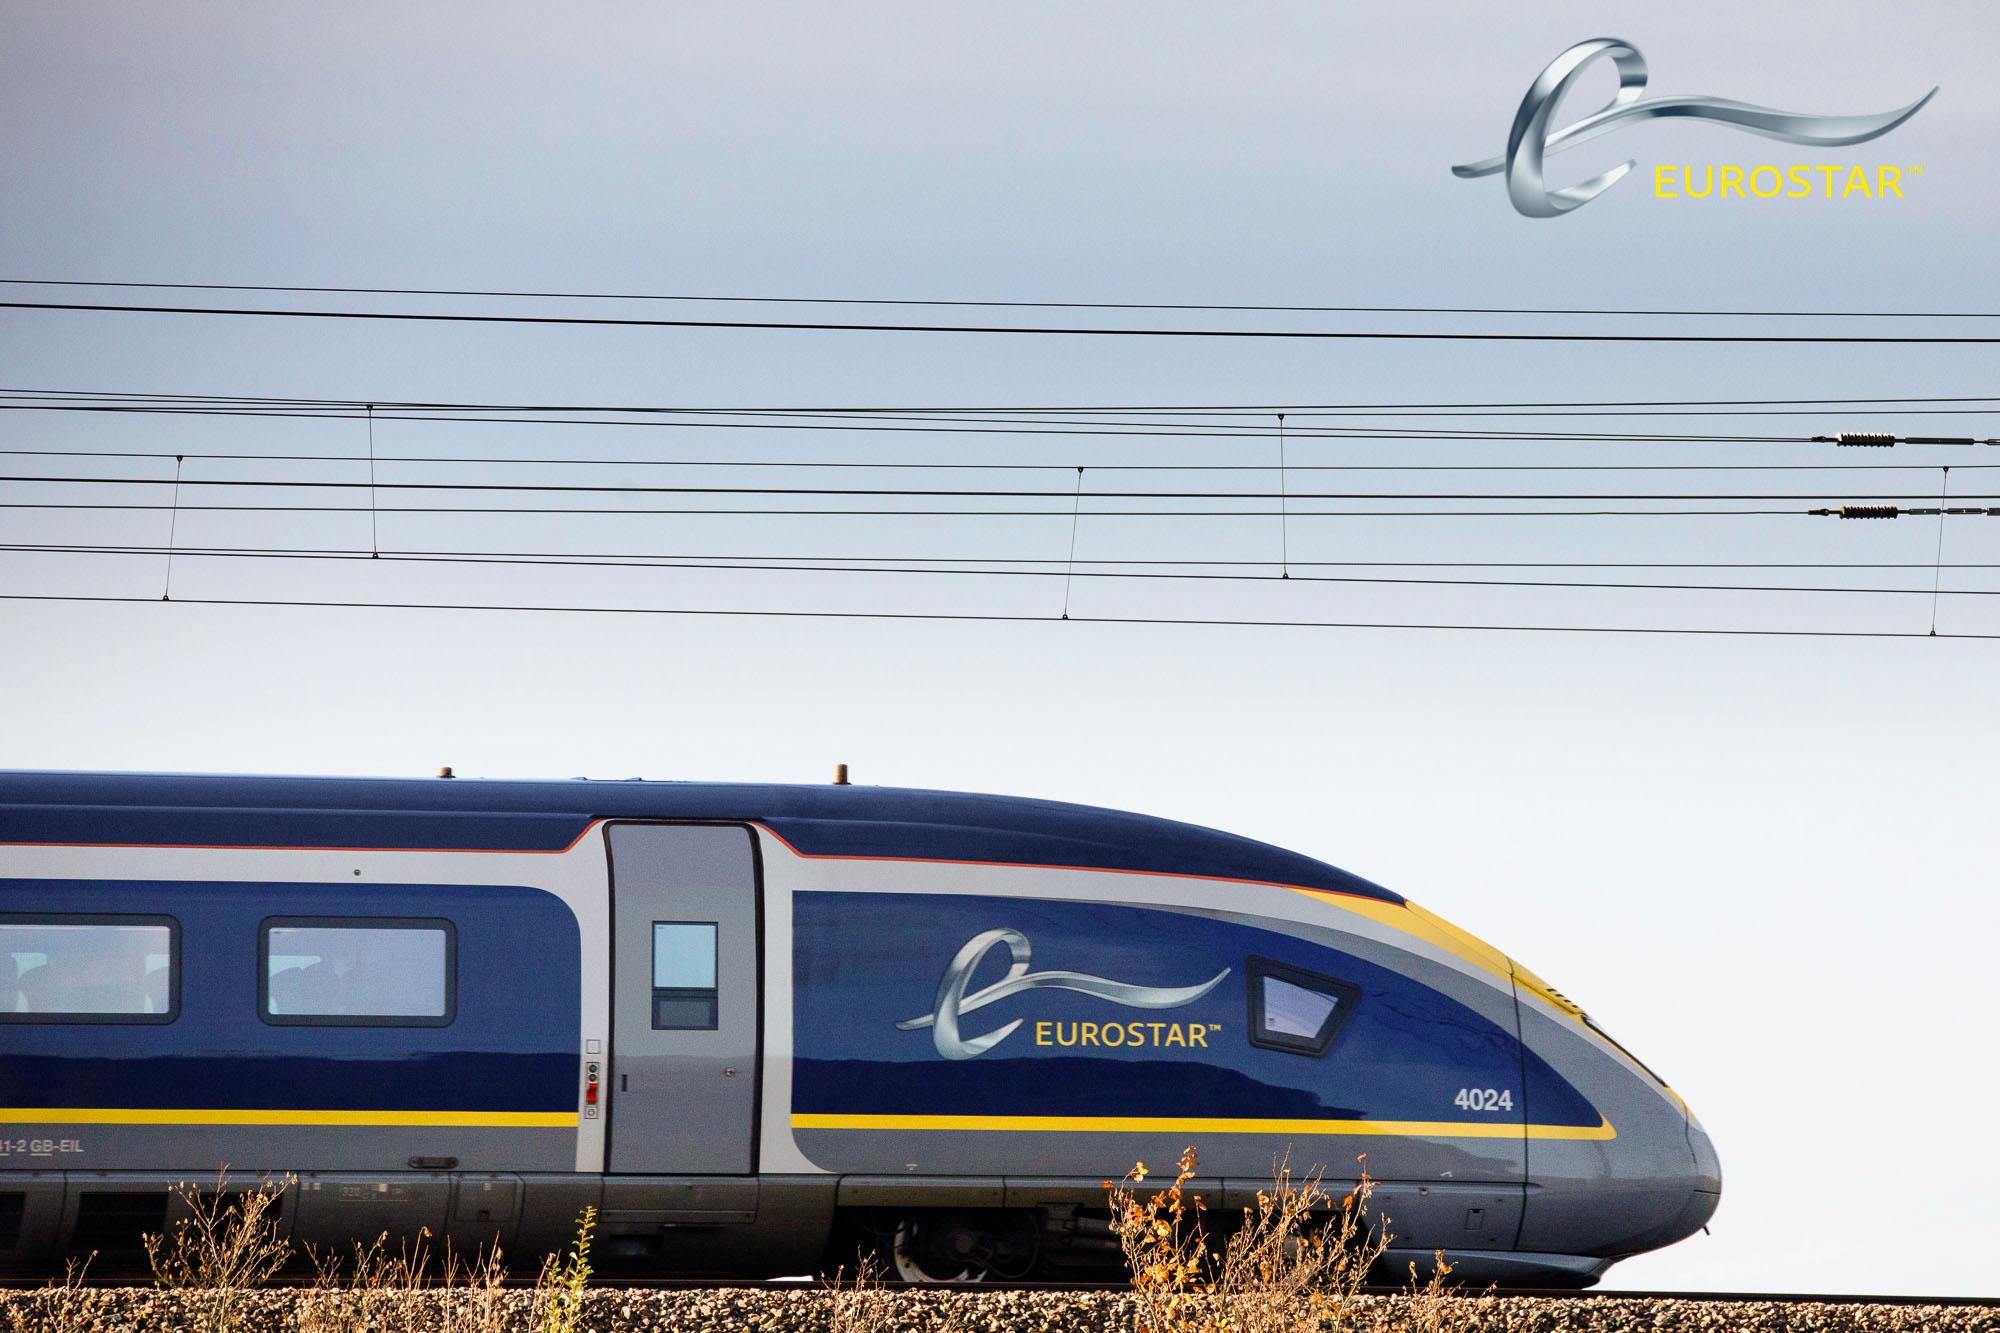 171119_Eurostar_Verbatim_056_R (1).jpg